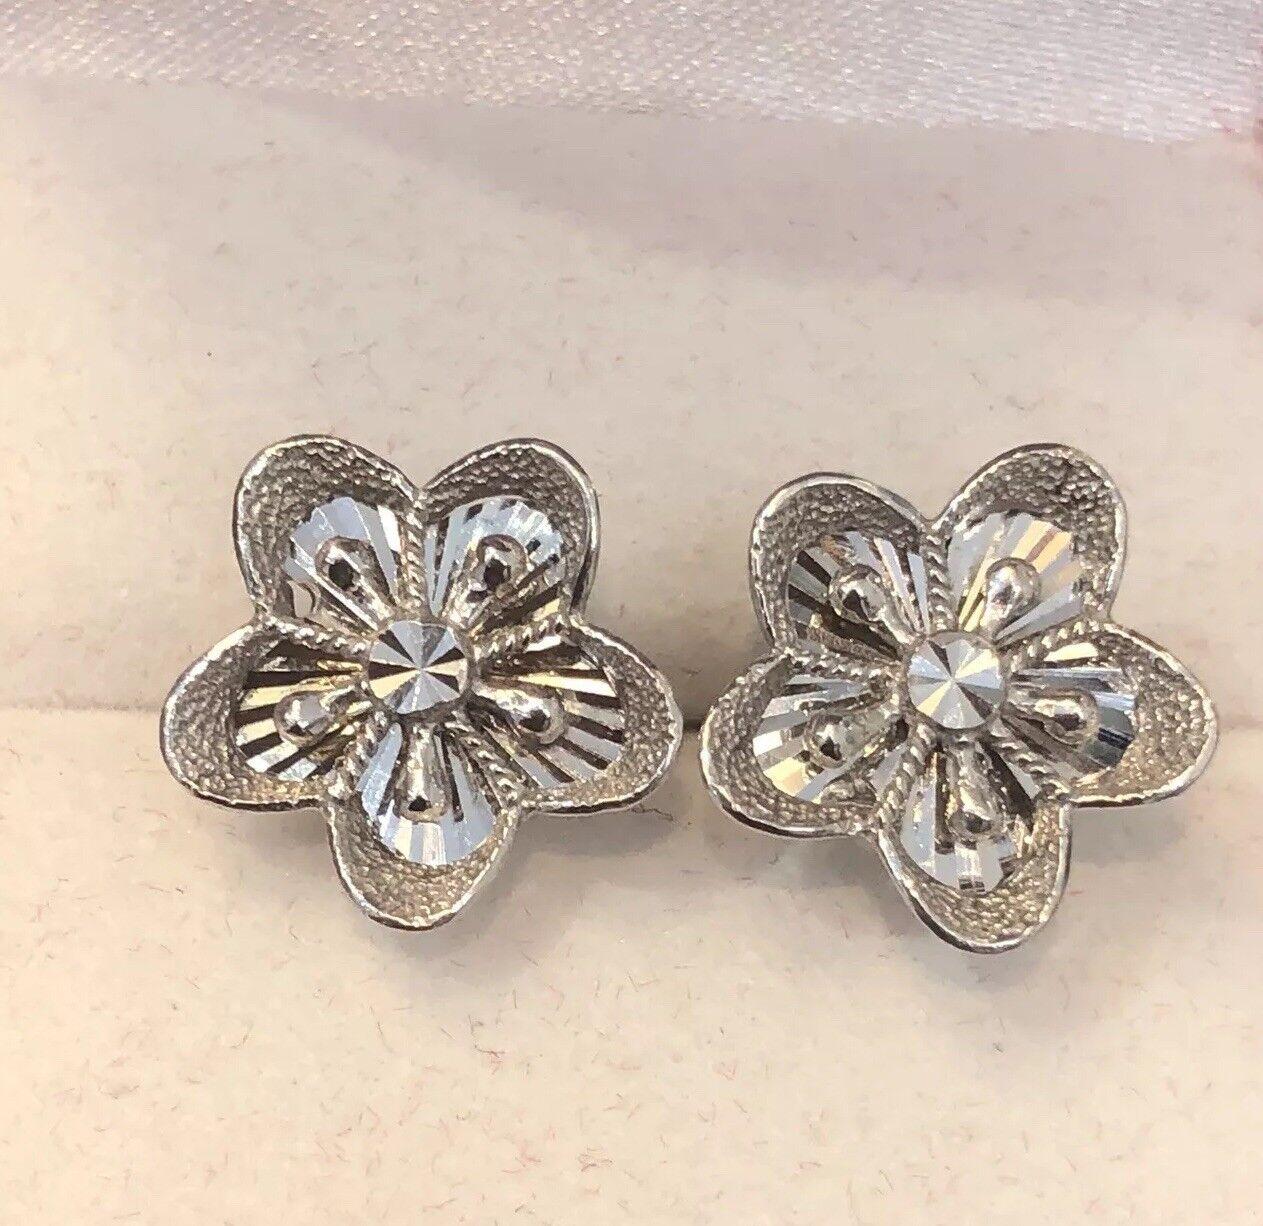 37ff20677 18K Solid White gold Flower Diamond Cut Earrings 3.3 Women Grams ...